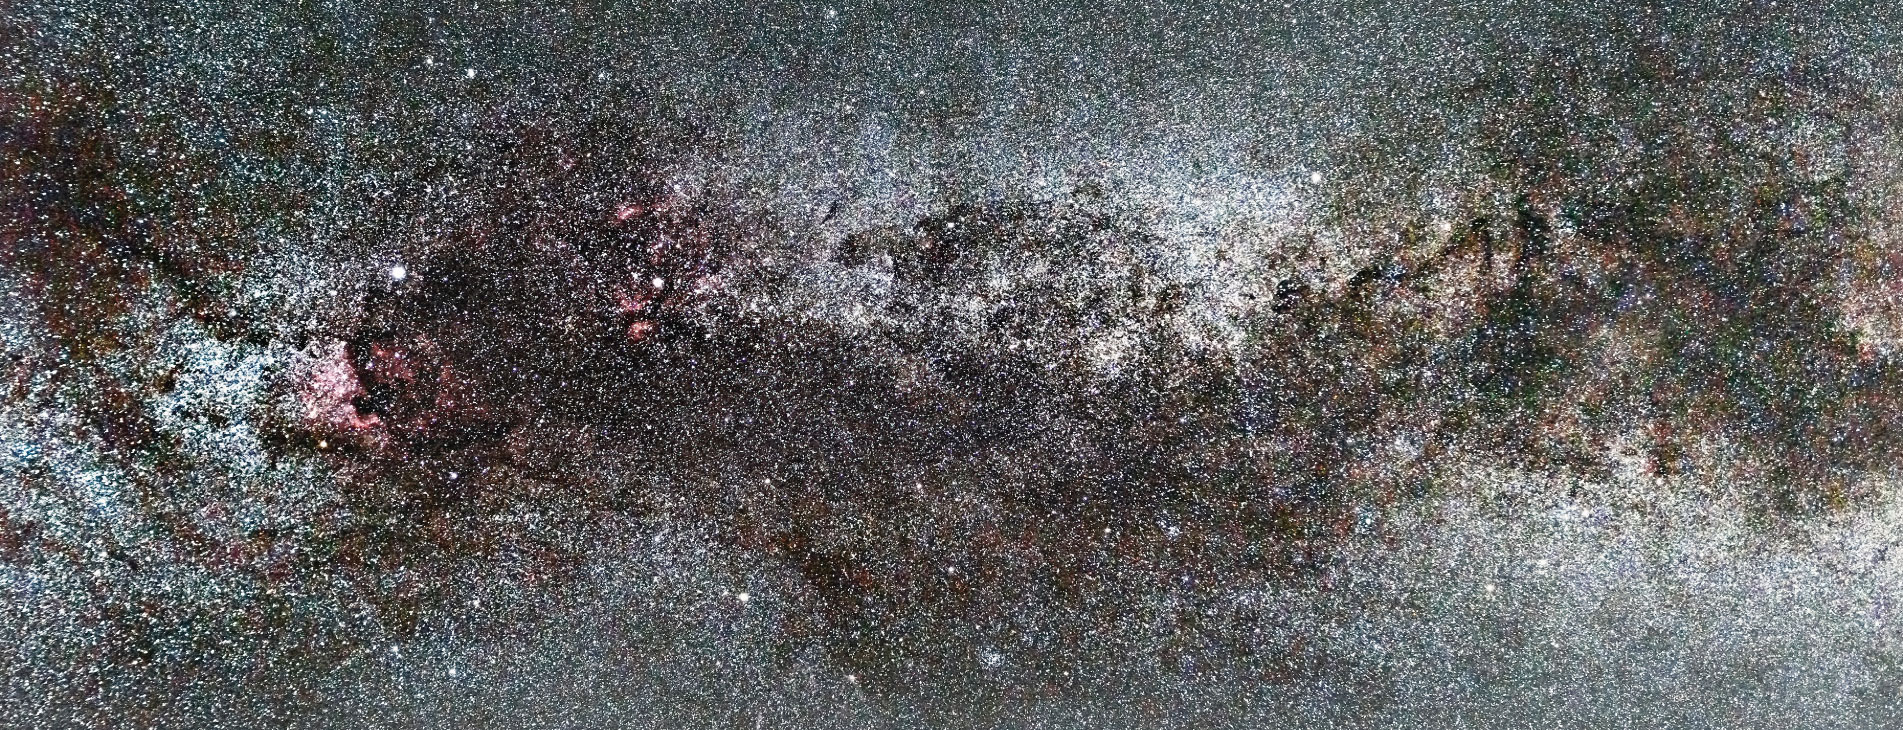 Milky Way galaxy, cygnus constellation, and the northern cross.